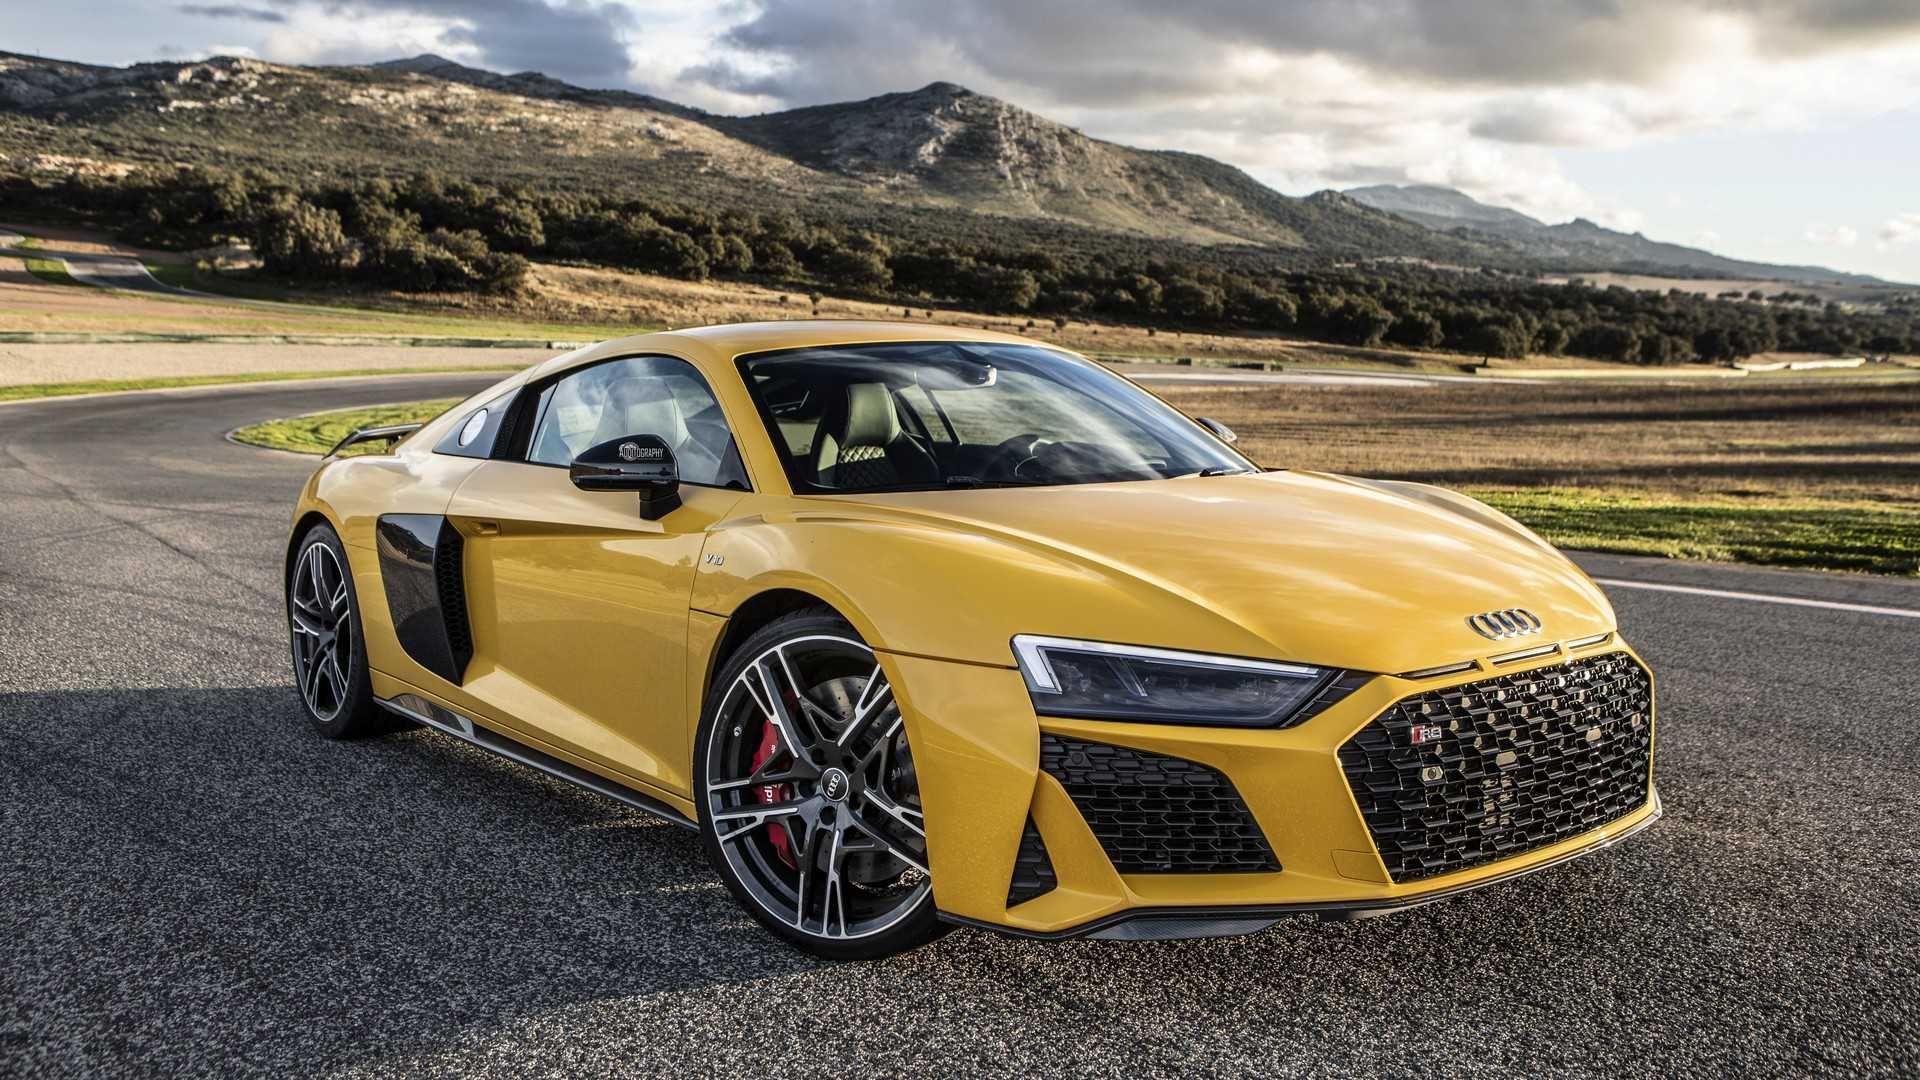 Prwth Epafh Me To Audi R8 V10 Performance Quattro Automotors Gr Sports Cars Luxury Super Cars Audi R8